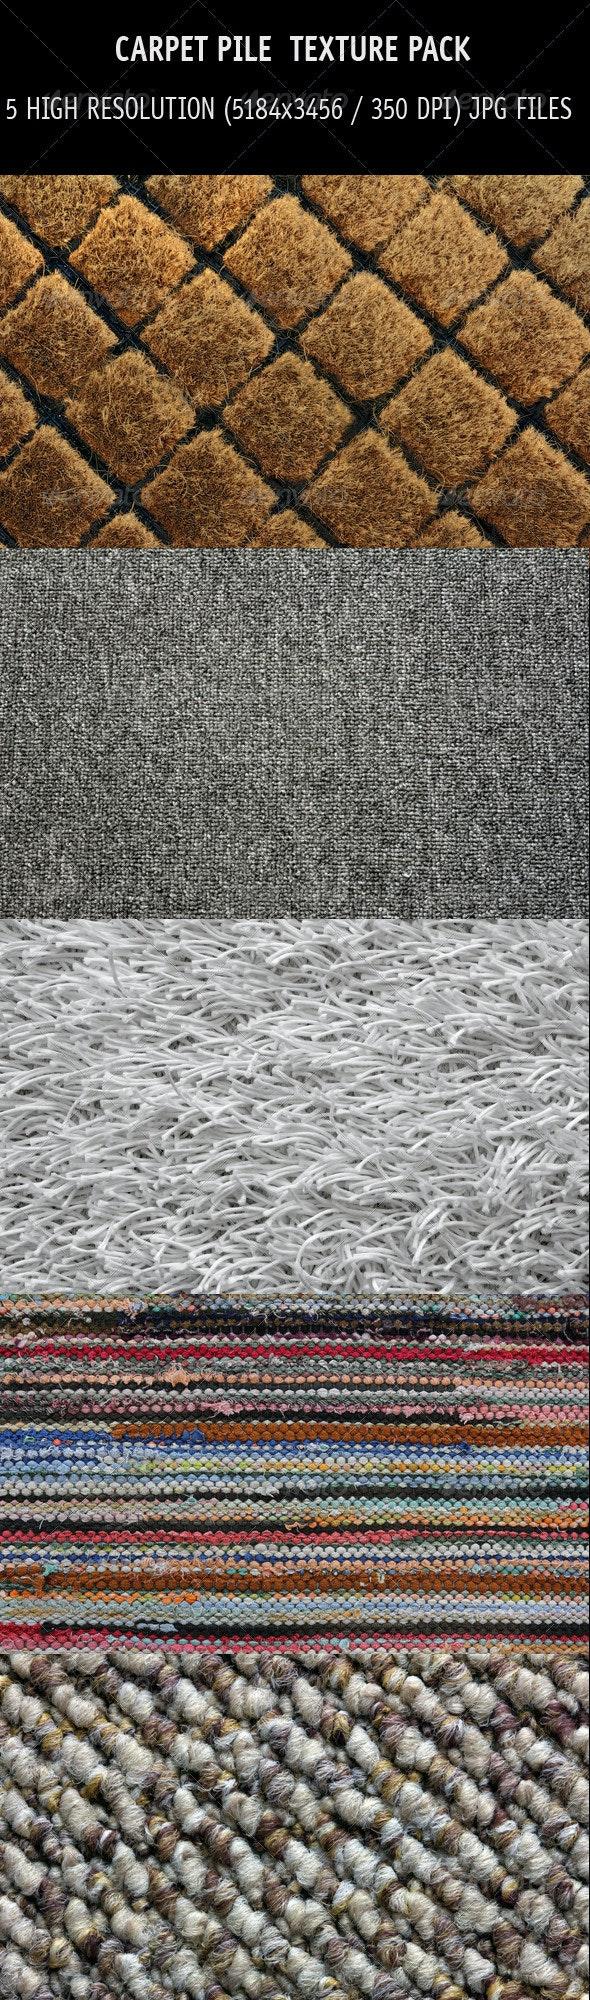 Carpet pile texture pack - Fabric Textures